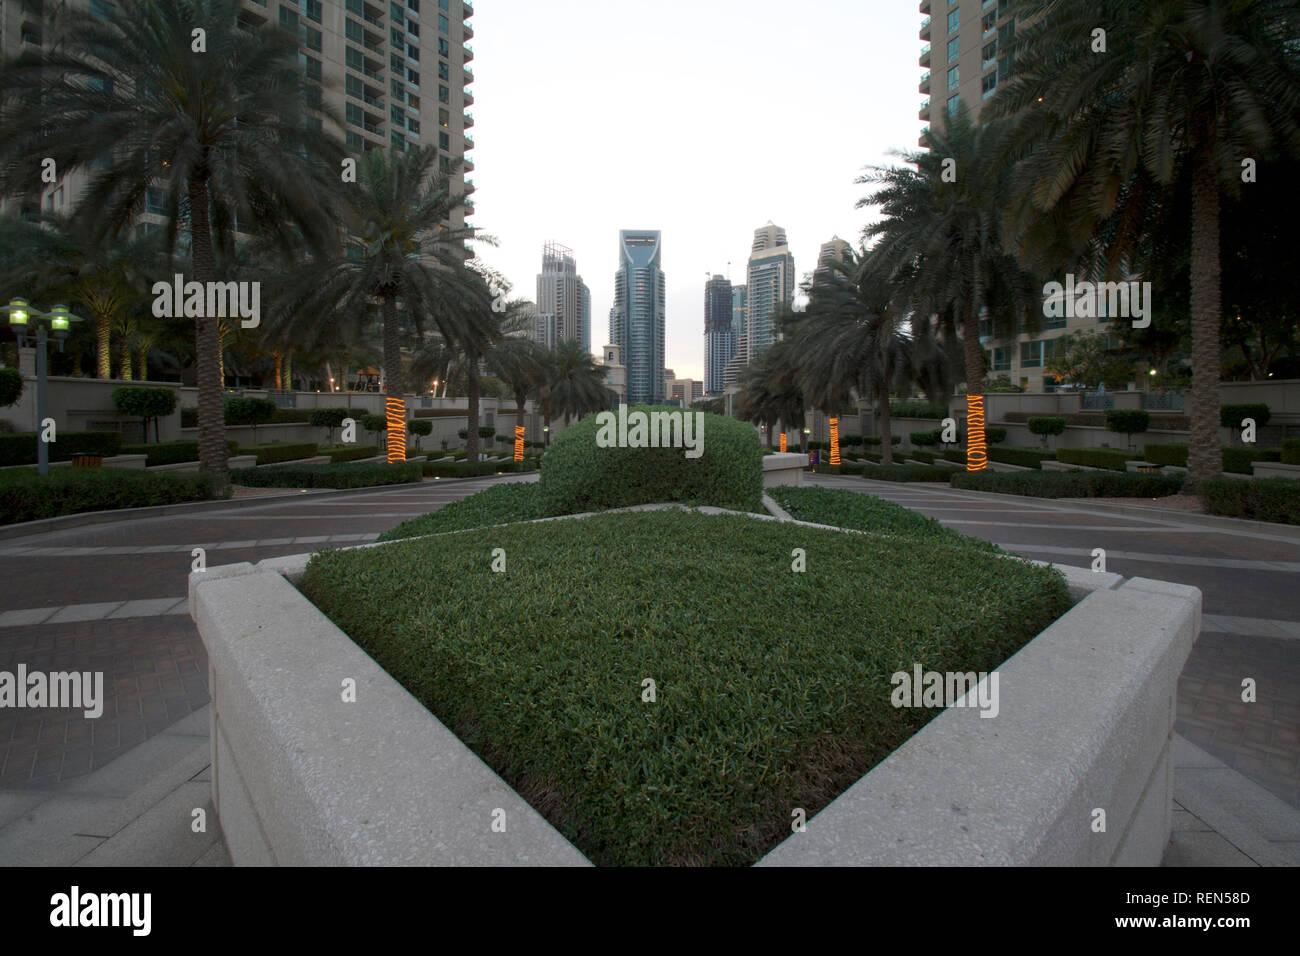 Marina Dubai-Entrance caminando hacia el atardecer Imagen De Stock